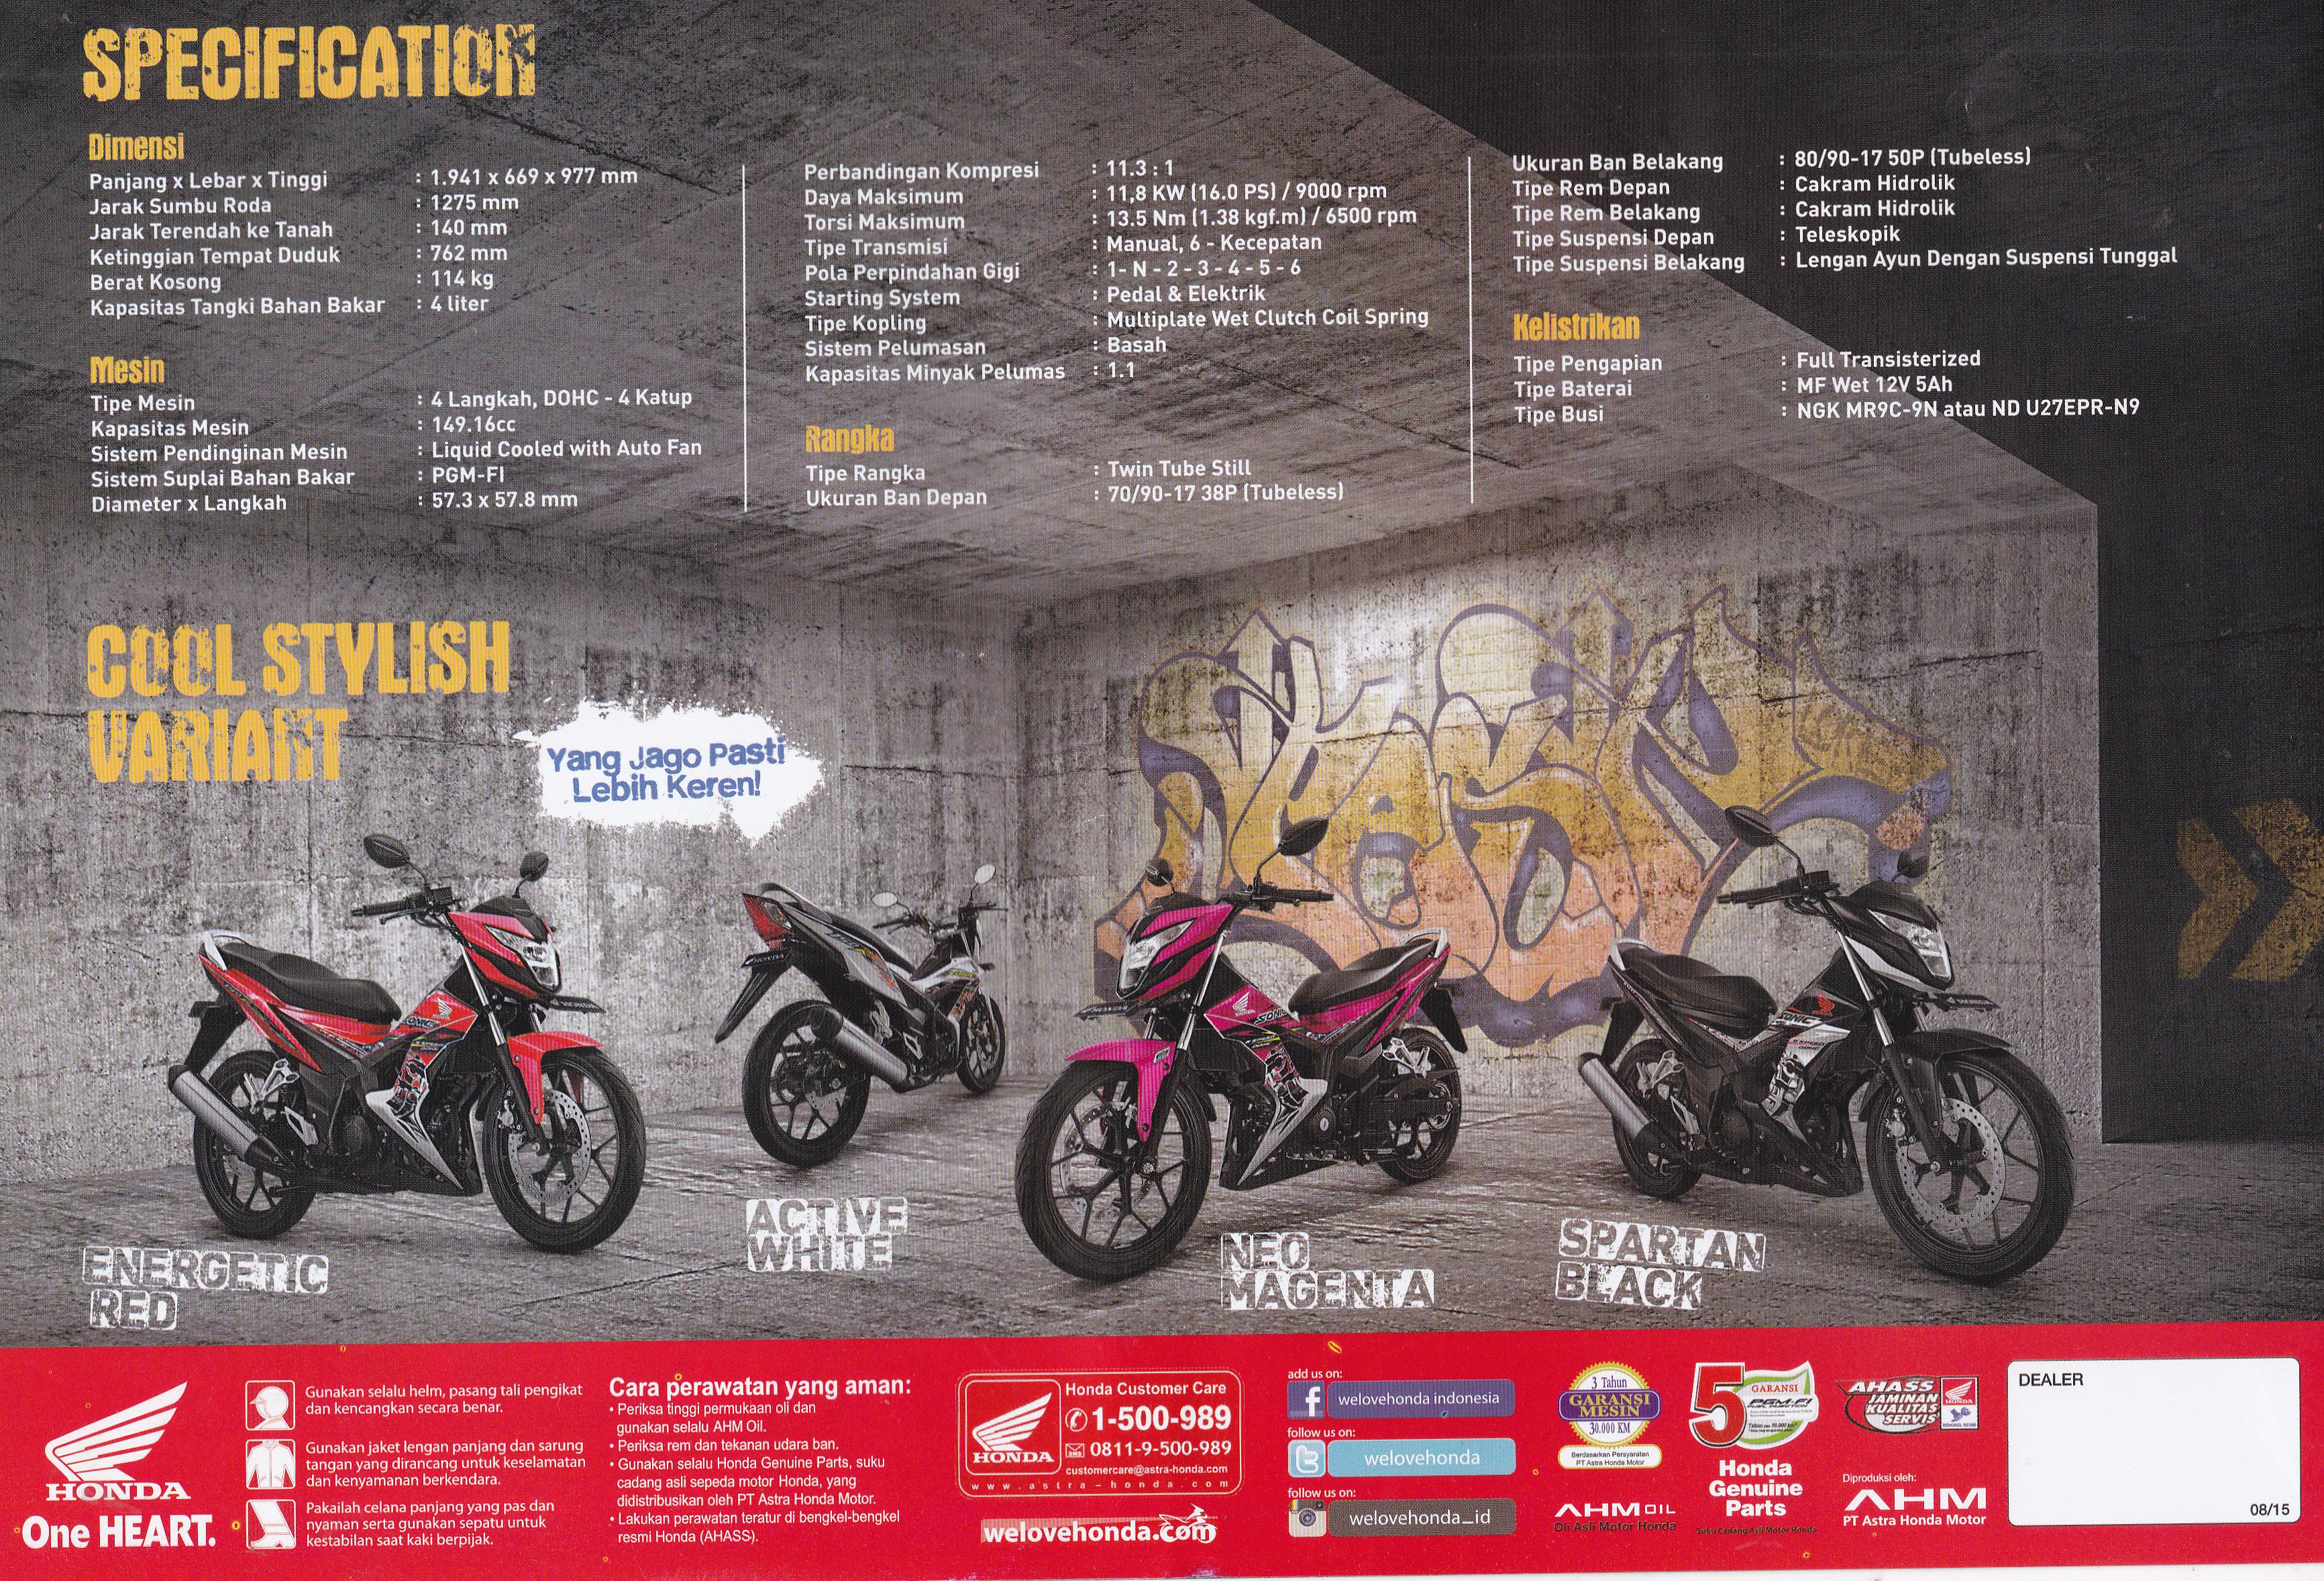 Sepeda Motor Page 113 New Vario 110 Esp Cbs Estilo Black Kendal Sonic2